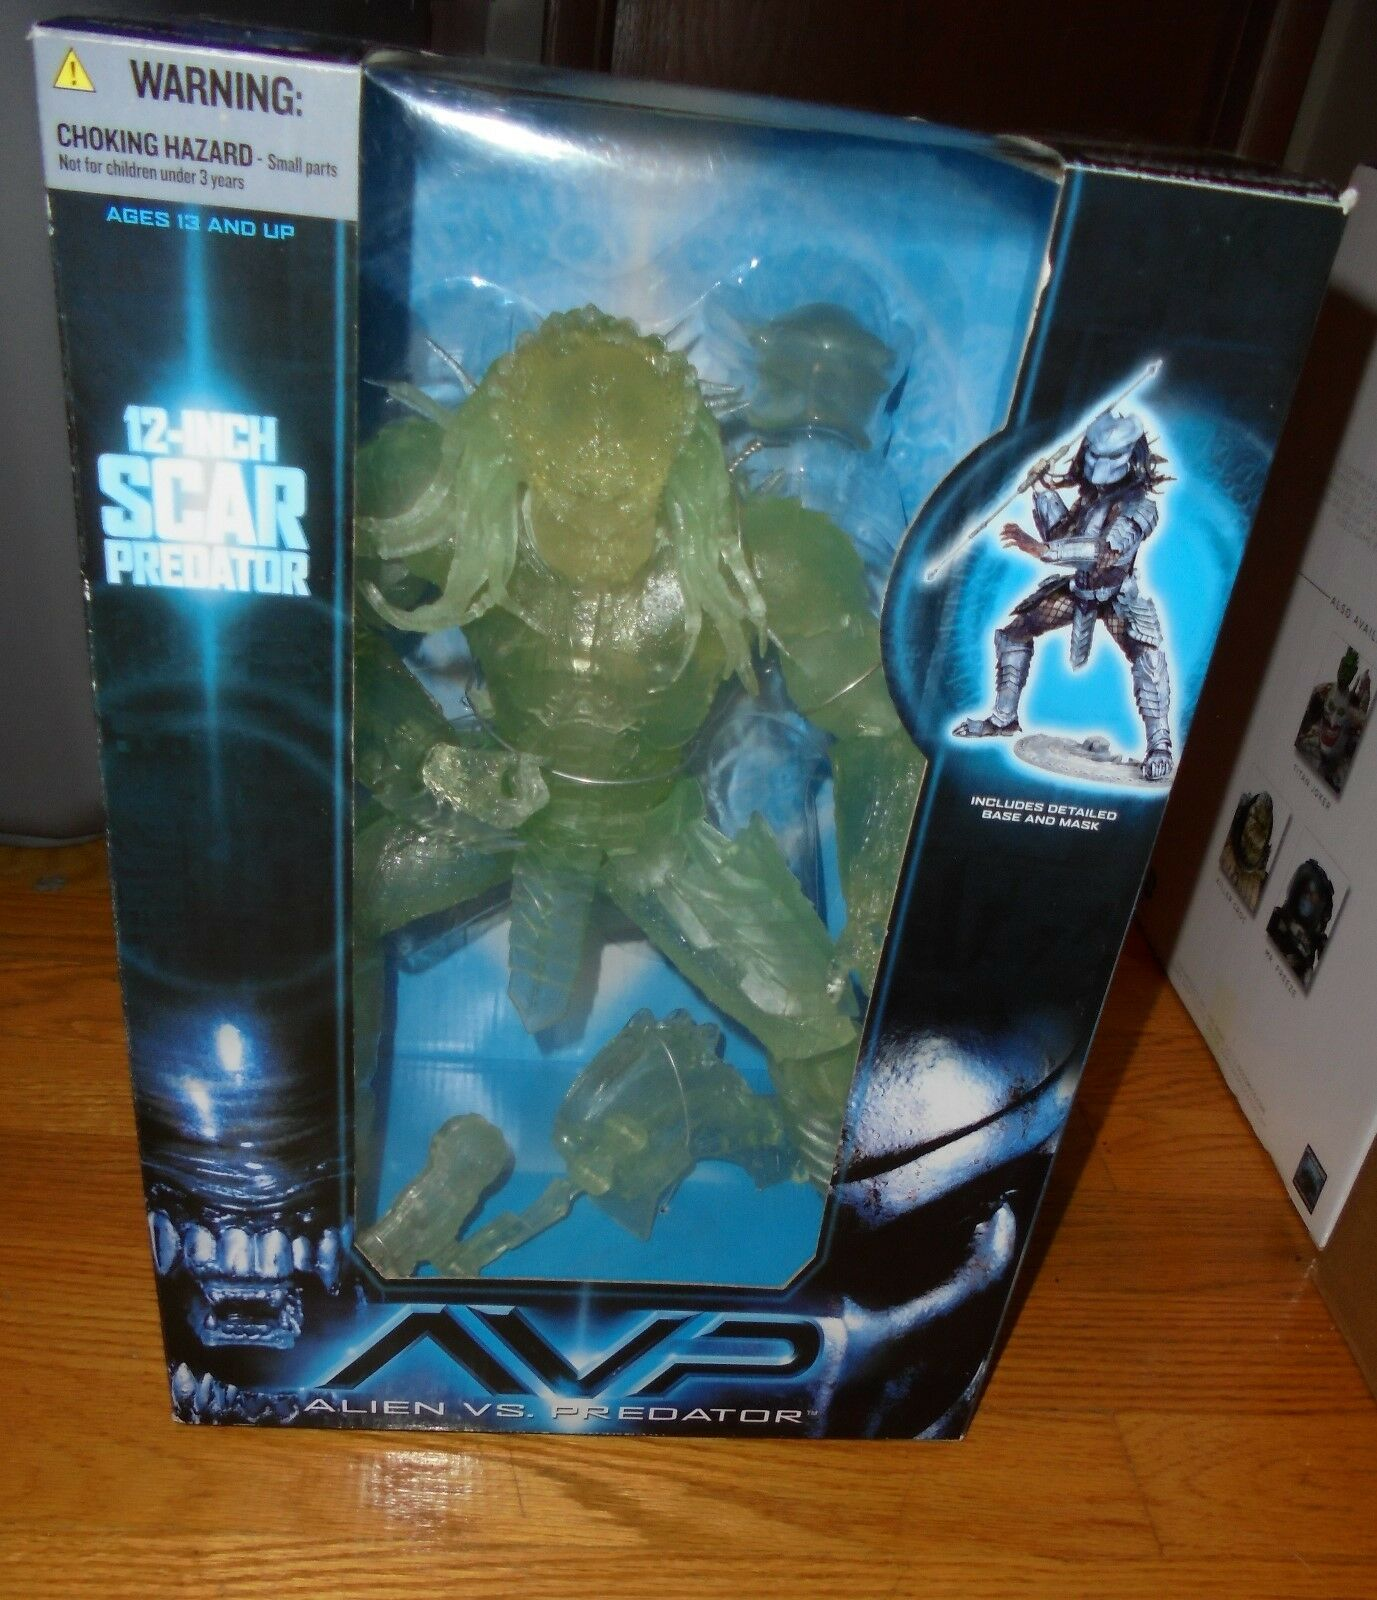 AVP Alien VS Predator  SCAR  Predator 12 12 12 inch action figure McFarlane 2006 cee878